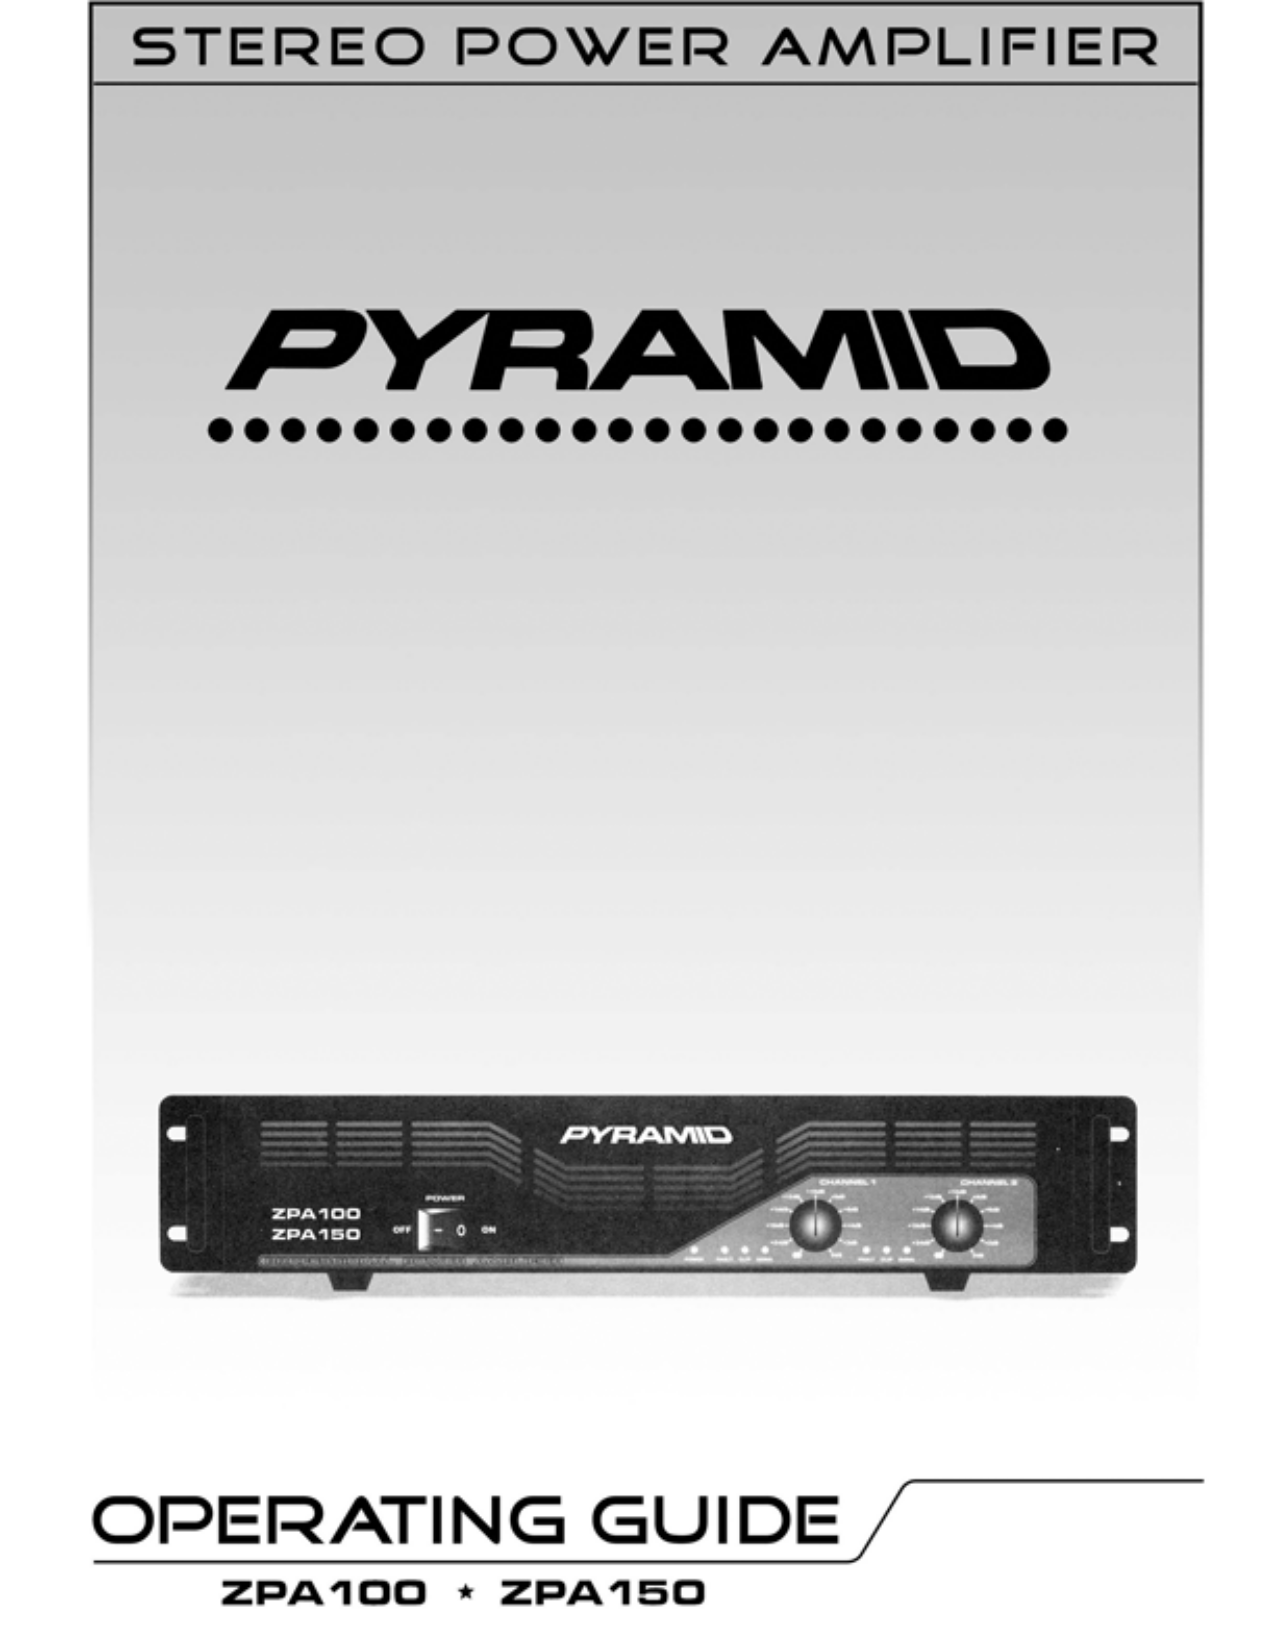 download free pdf for pyramid zpa100 car amplifier manual rh umlib com Pyramid Speakers Pyramid Pro 800 Watt Car Amplifiers